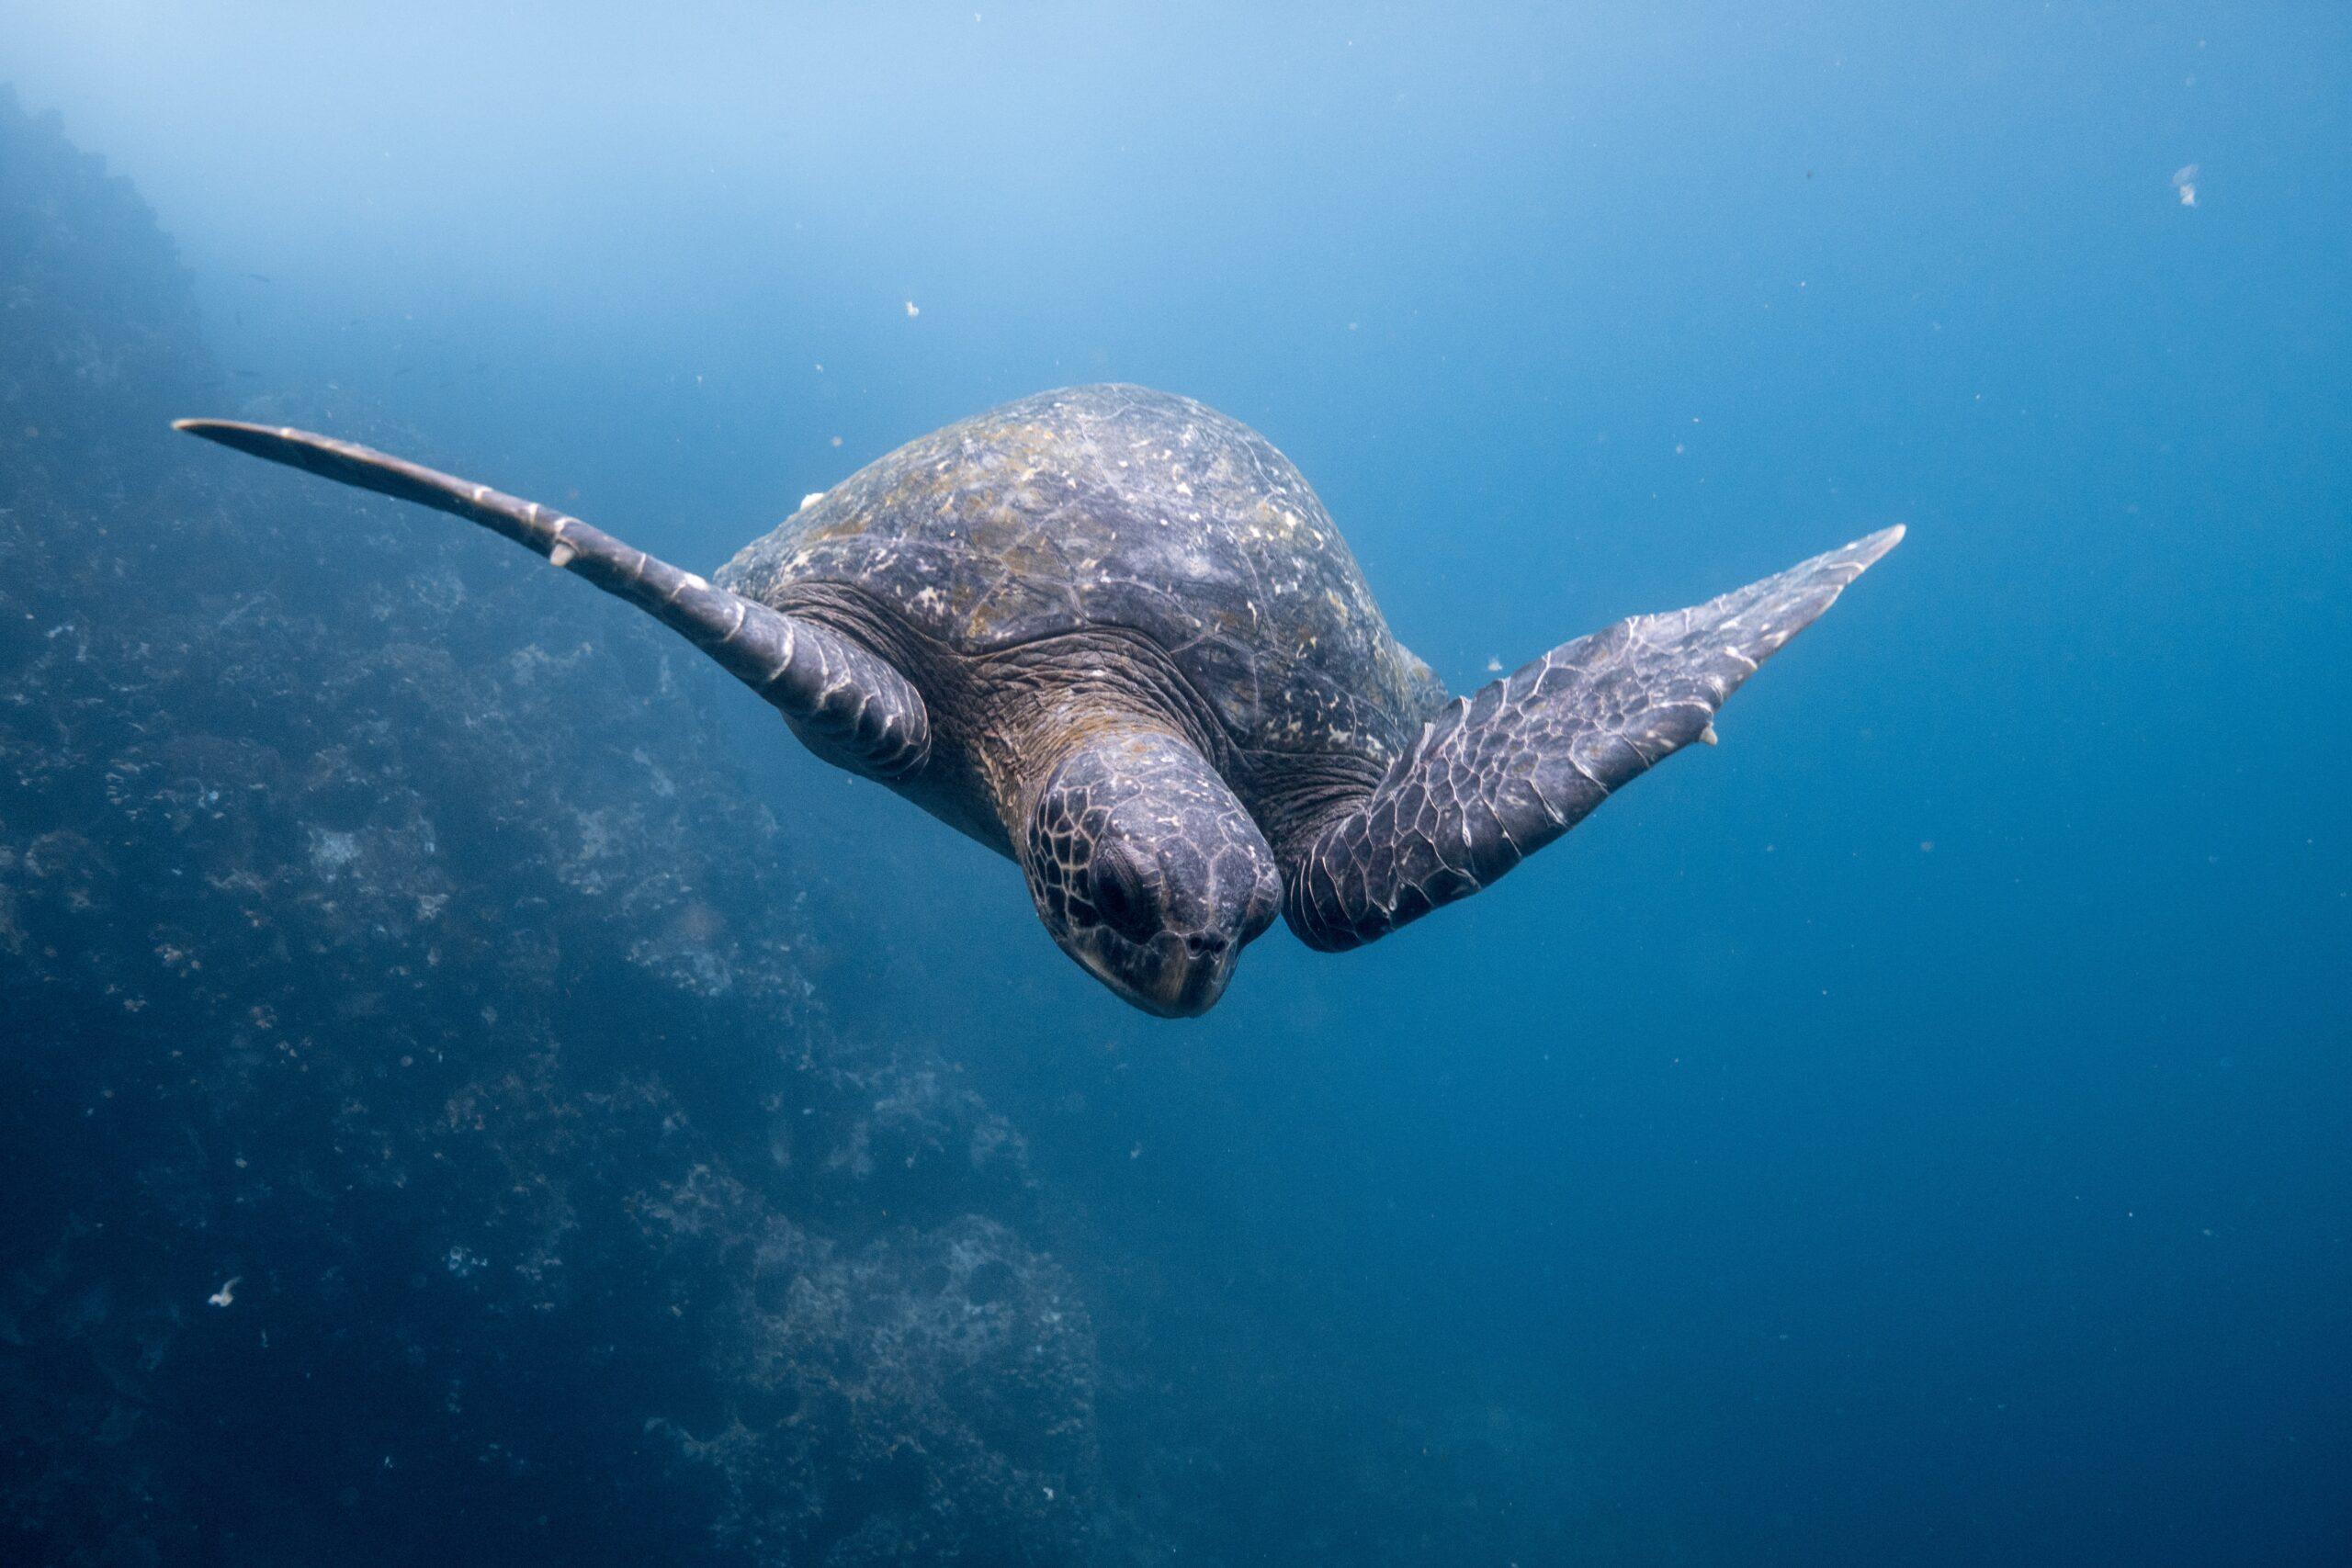 International Organizations Urge Ecuador to Expand Galapagos Marine Reserve